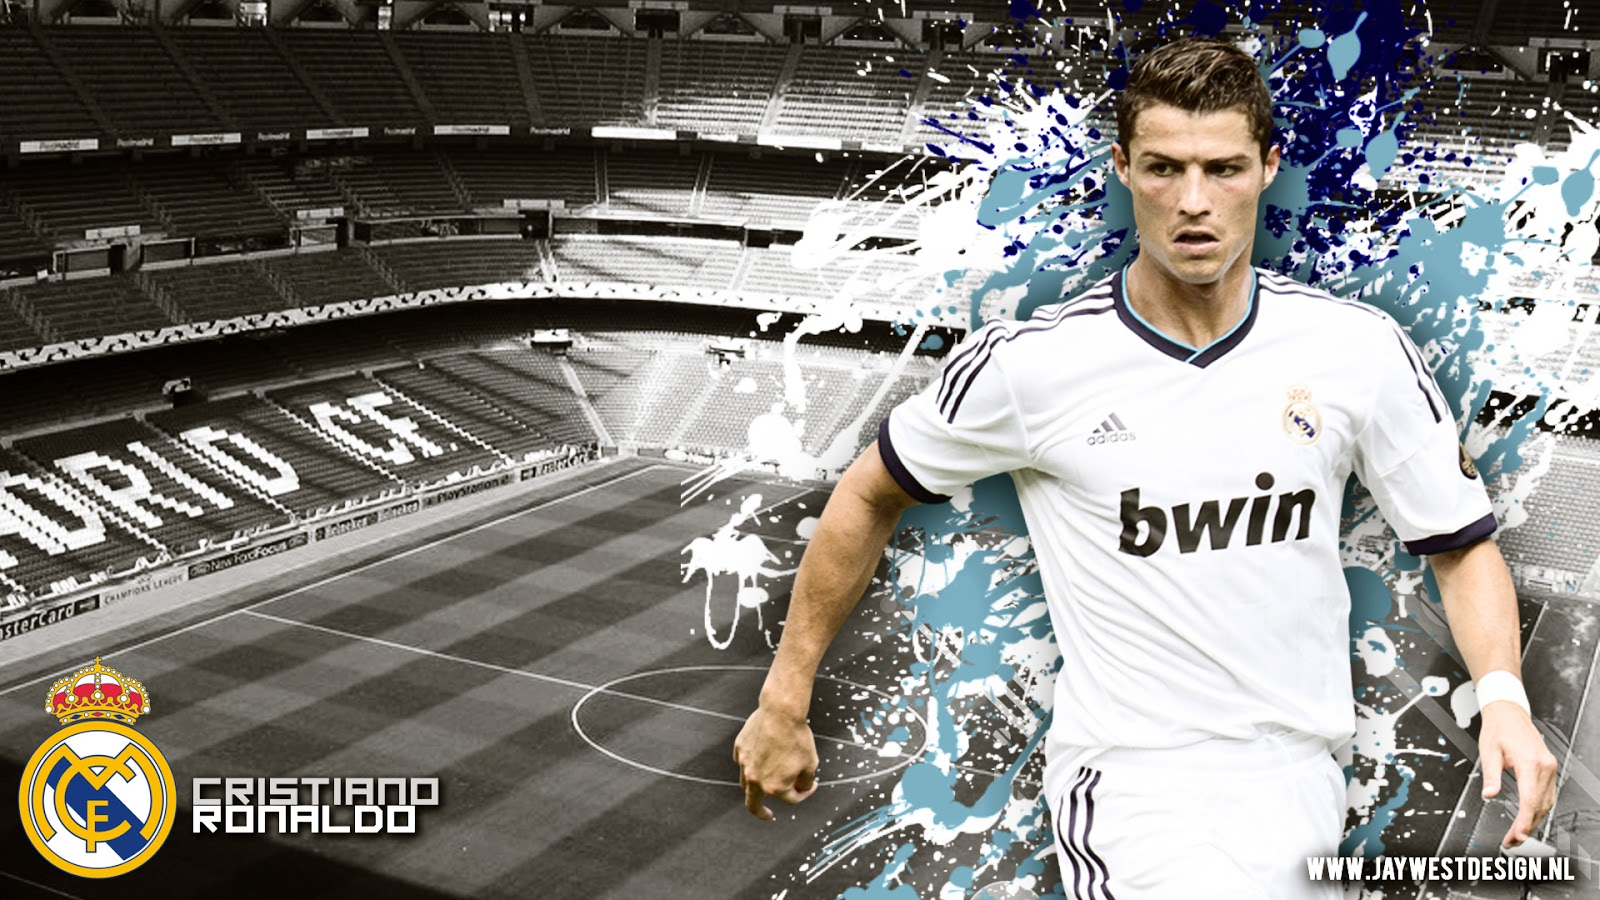 ... Ronaldo Cristnao Ronaldo Dos Santos Aviero Wallpapers Fond d'ecran